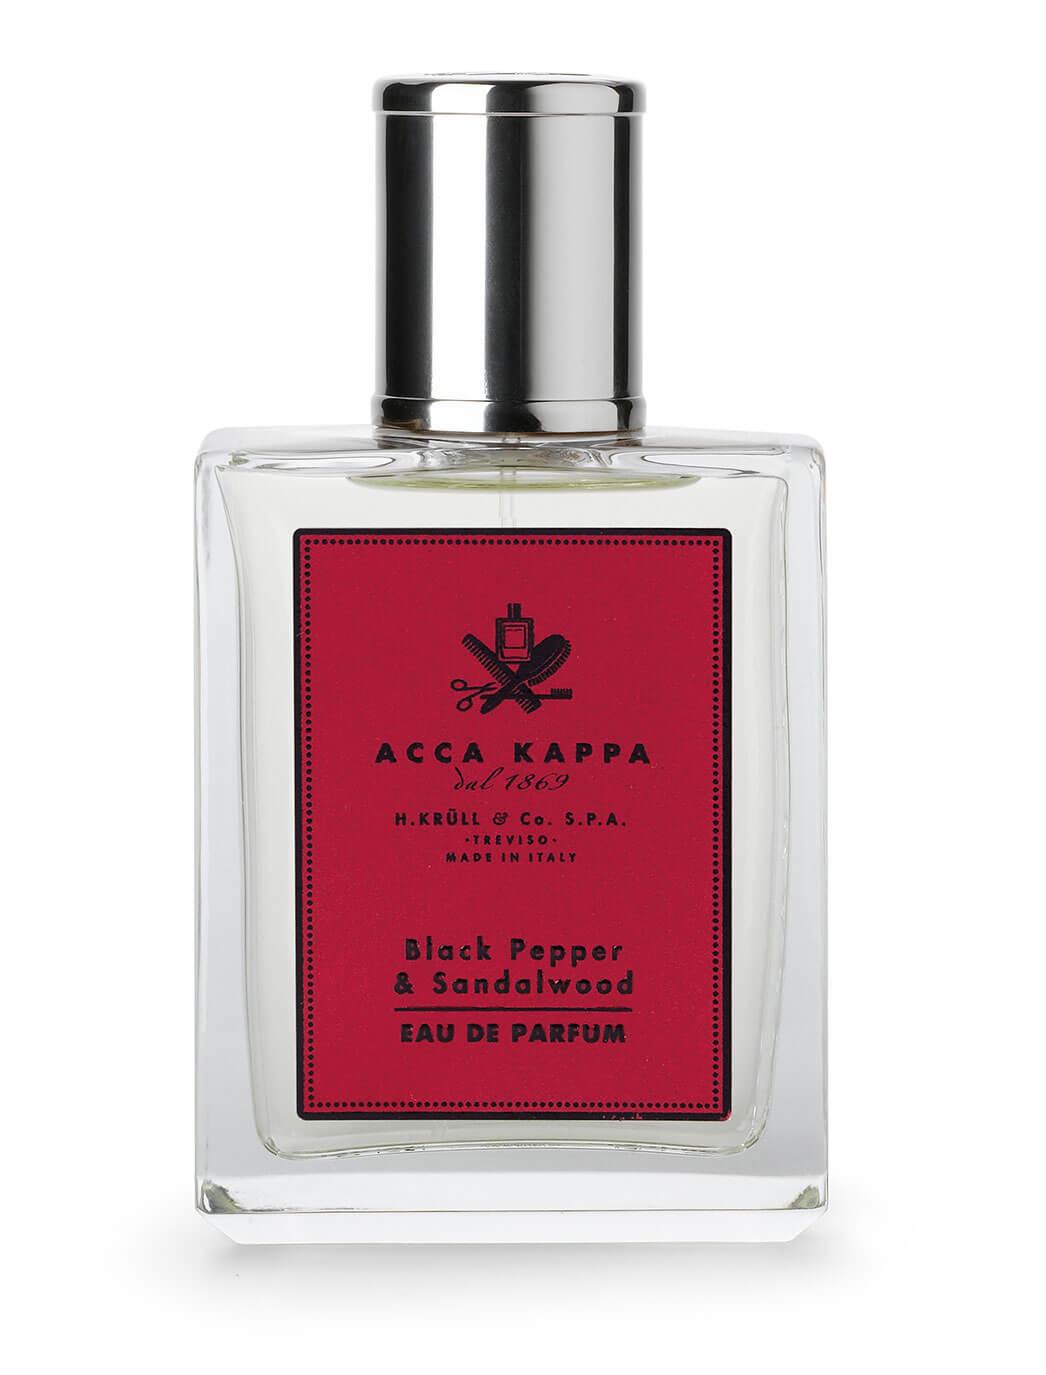 Acca Kappa Black Pepper and Sandalwood Eau De Parfum.